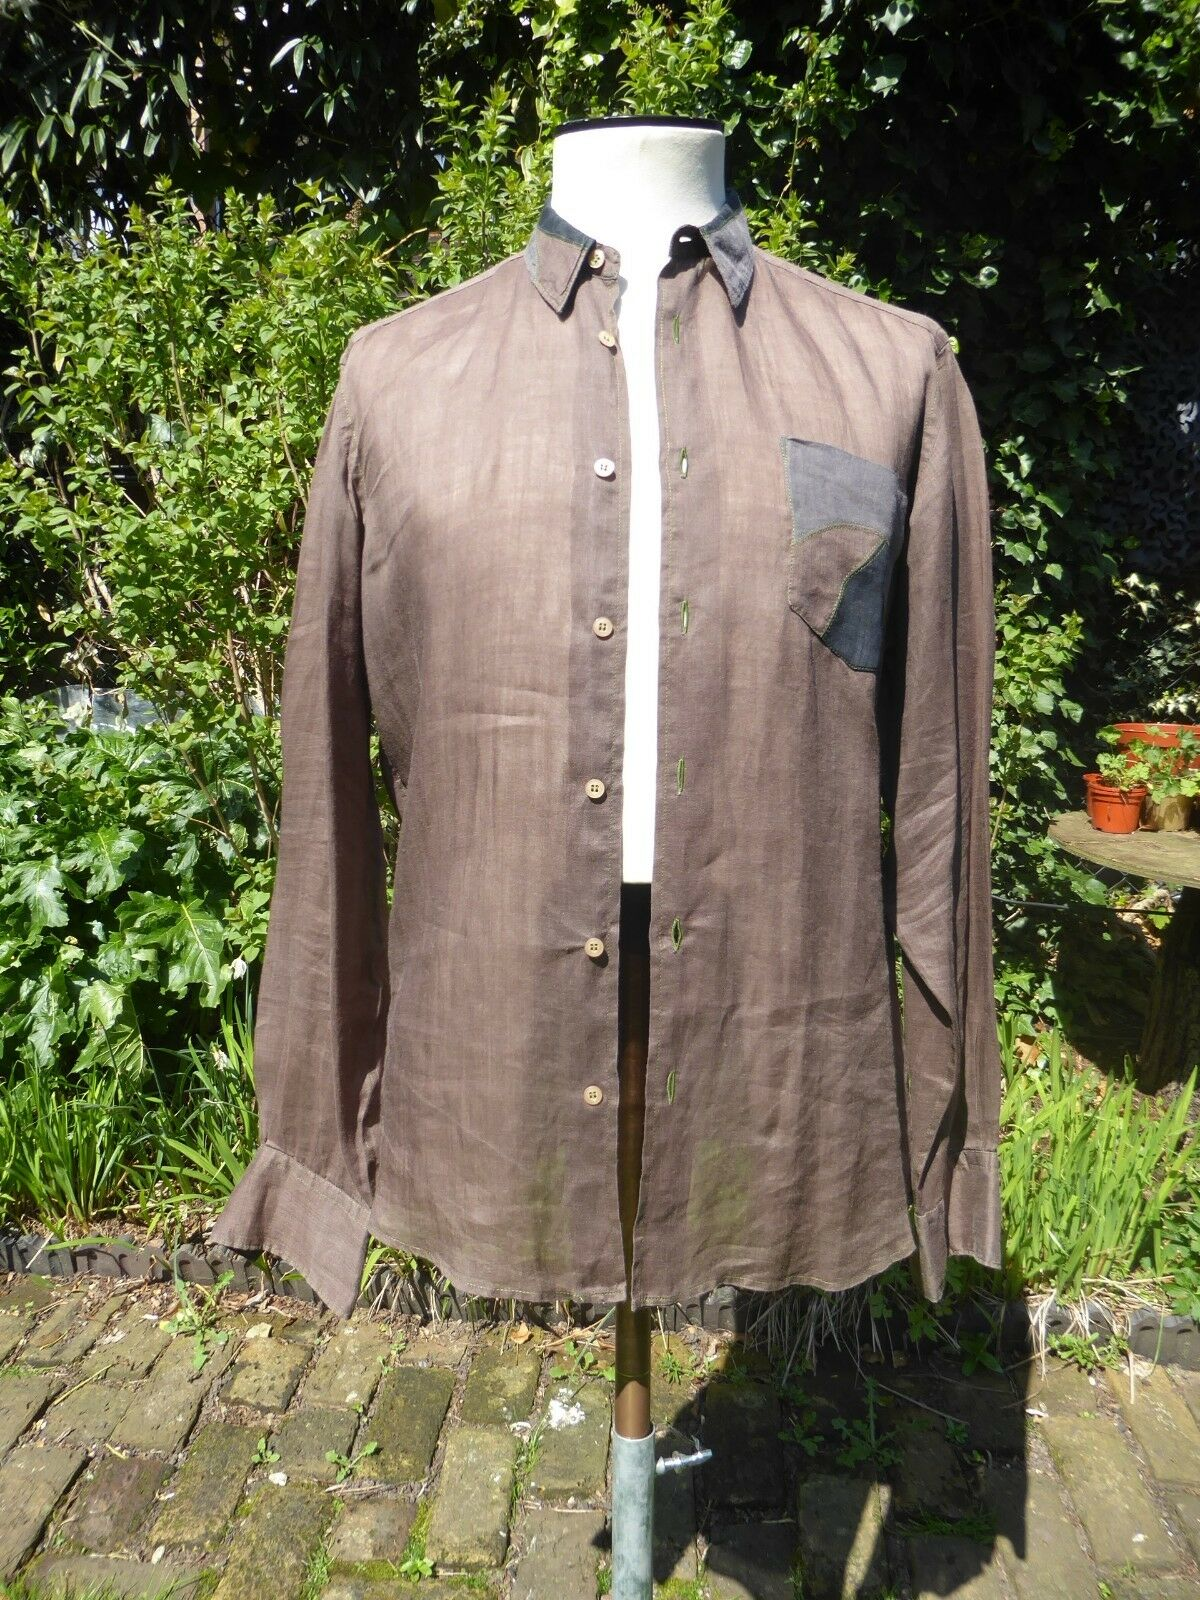 G. GUAGLIANONE 100% Brown Linen Designer Shirt M Excellent Condition